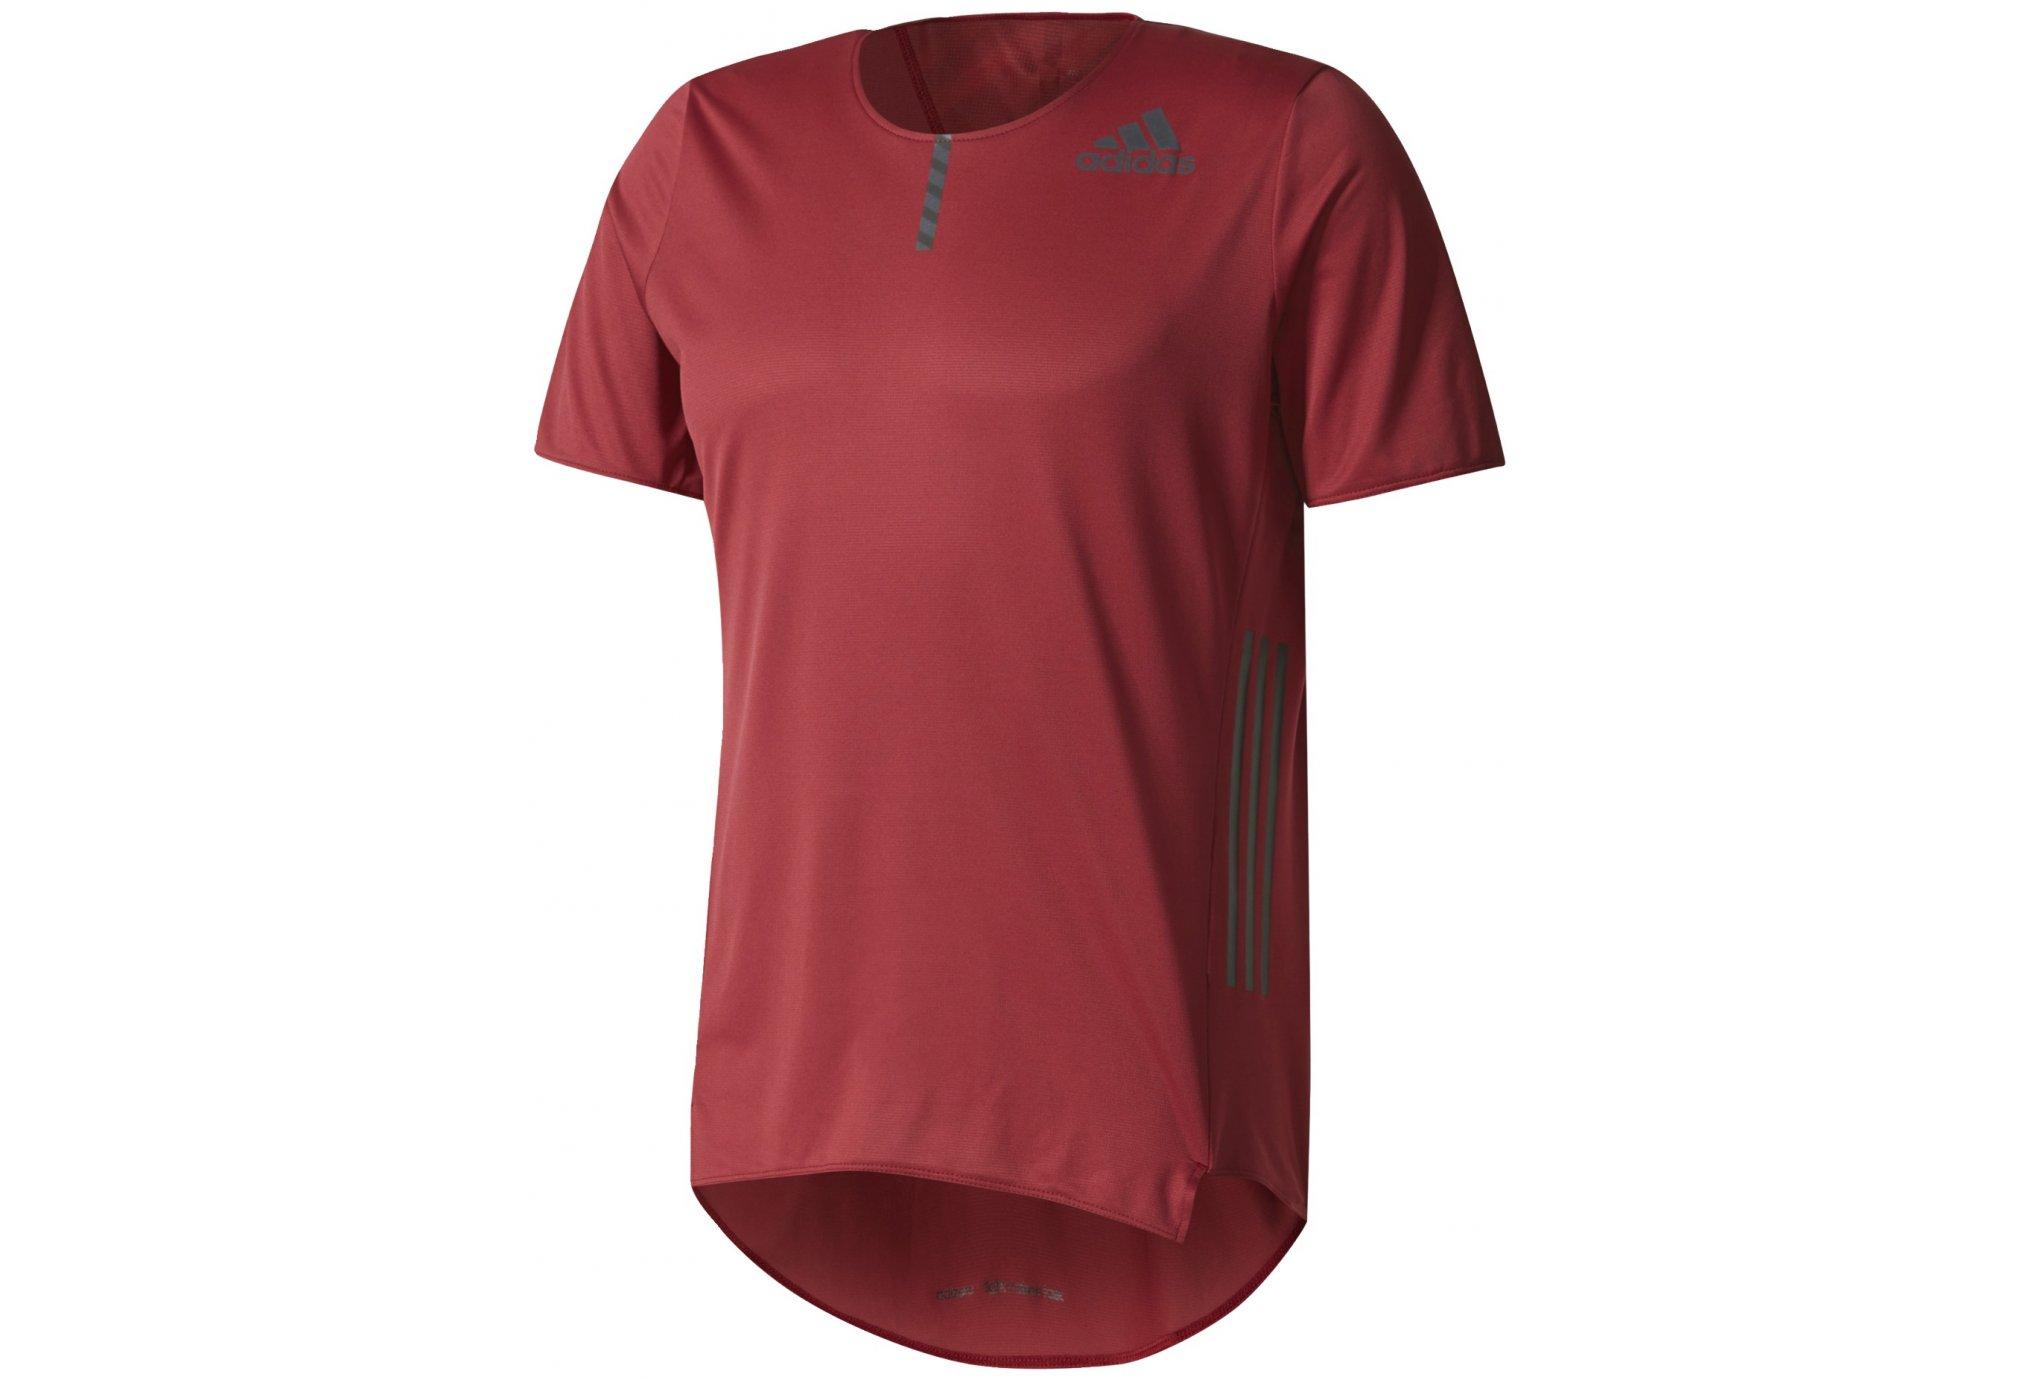 Adidas Adizero m vêtement running homme